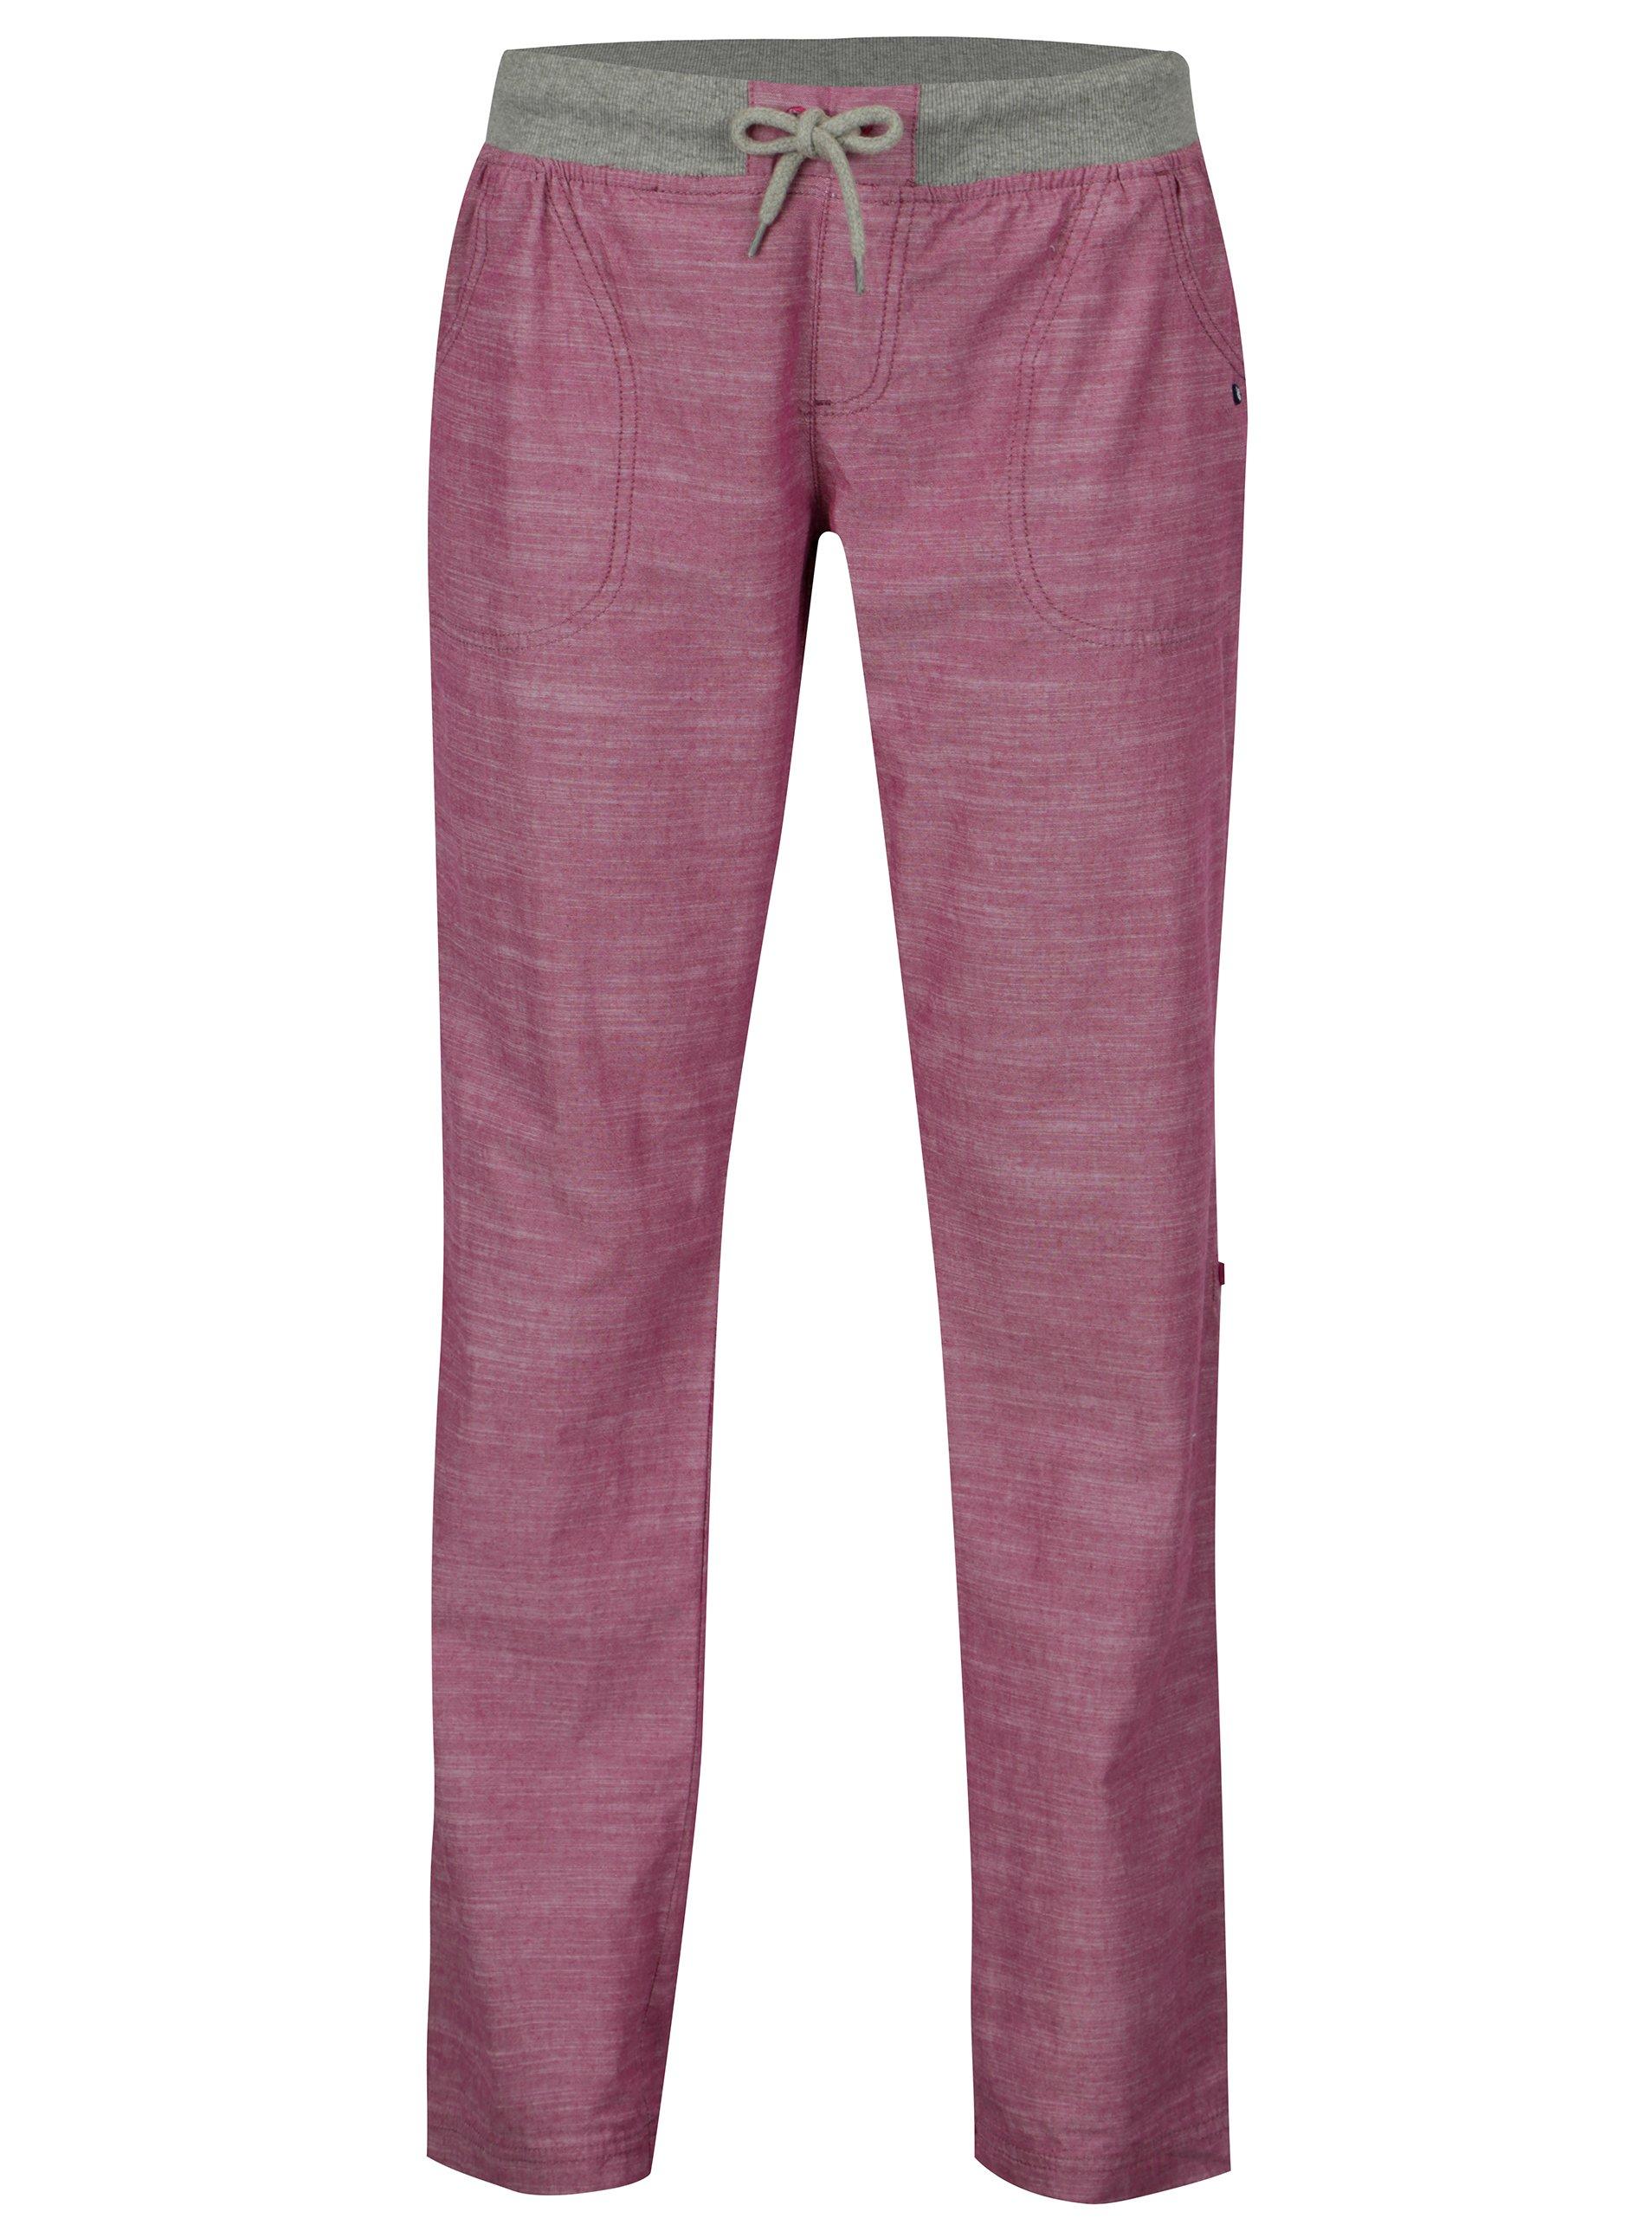 1d483ac93018 Ružové dámske nohavice LOAP Nadeta